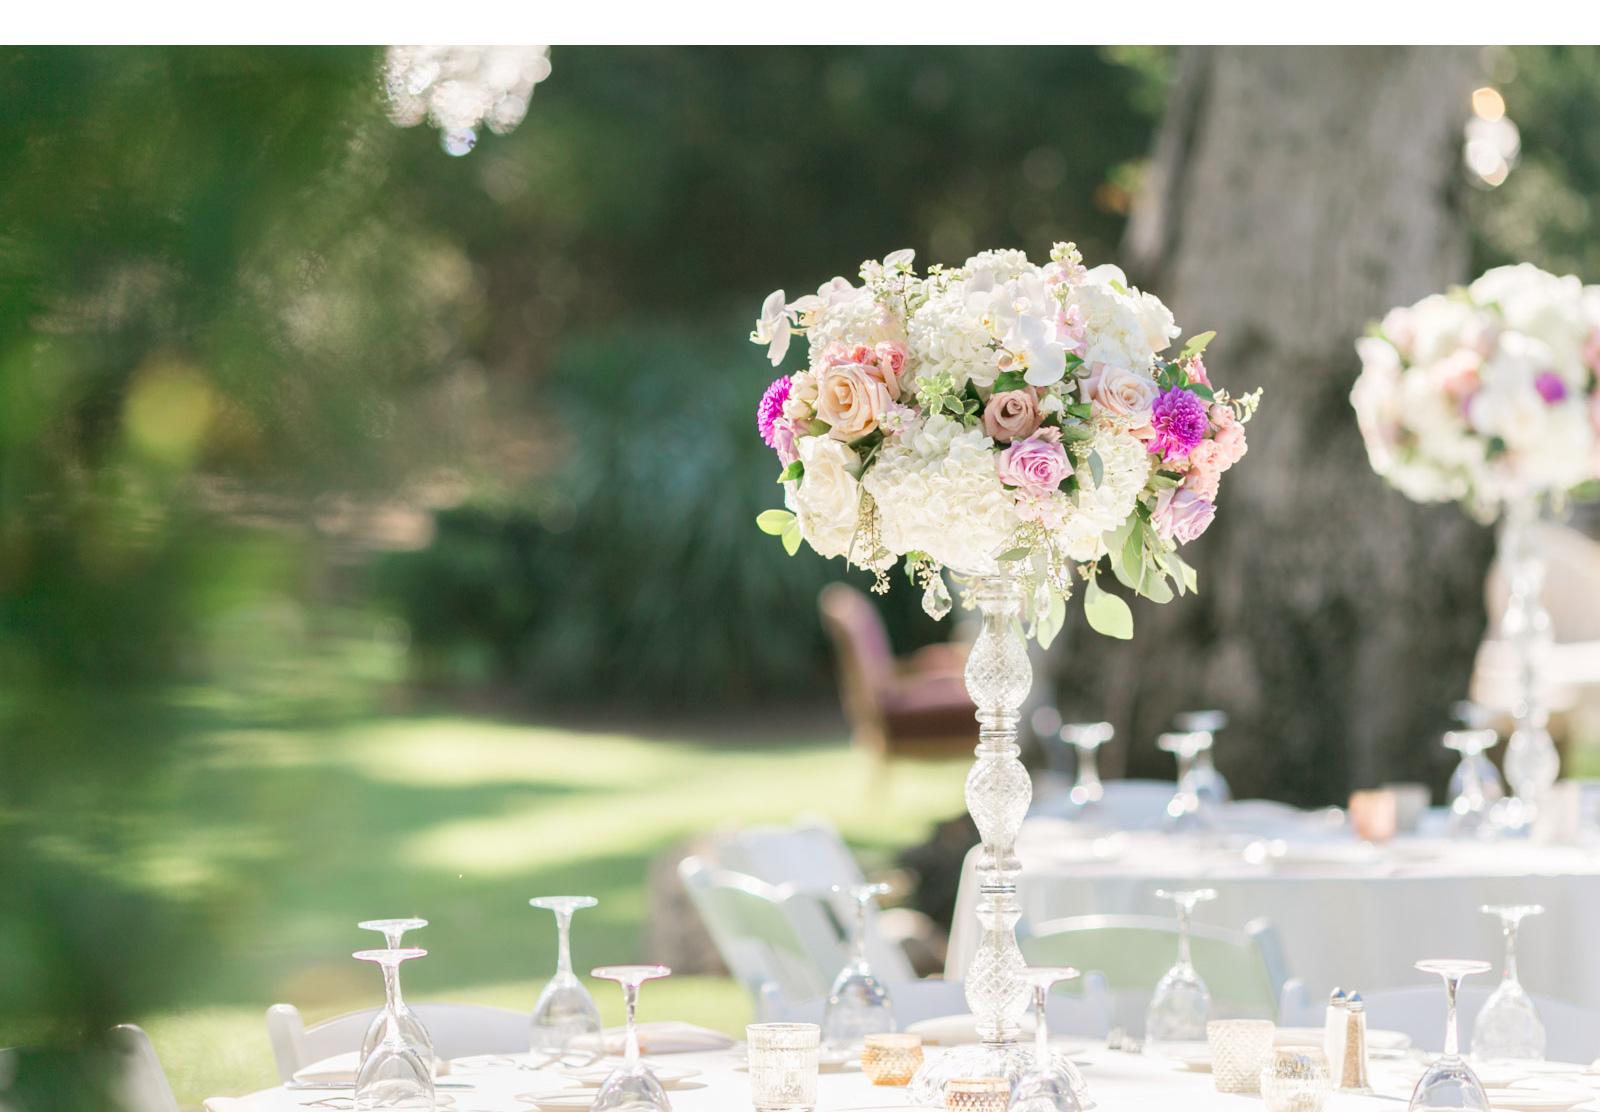 Temecula-Winery-Wedding-Natalie-Schutt-Photography_07.jpg